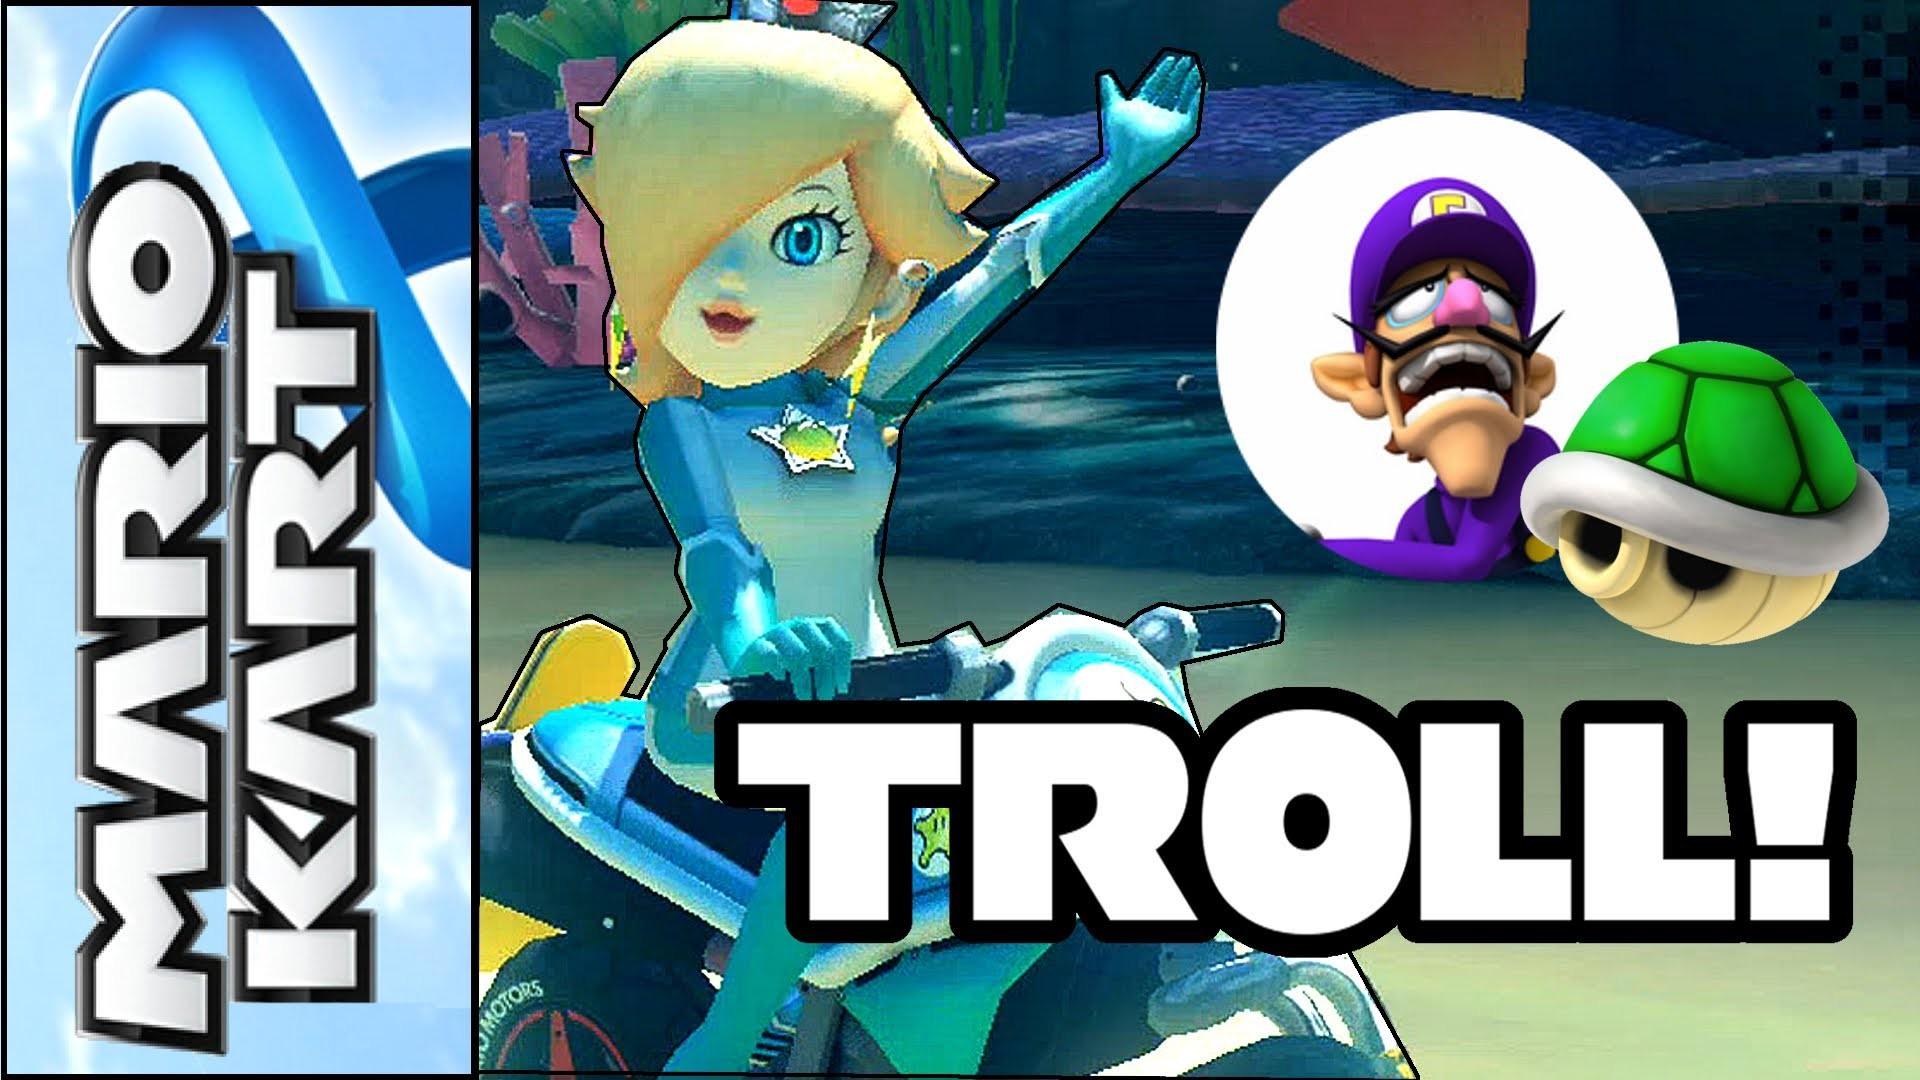 Mario Kart 8 – Rosalina trolls Waluigi at the Finish Line – Funny Moments  (Wii U Gameplay) – YouTube